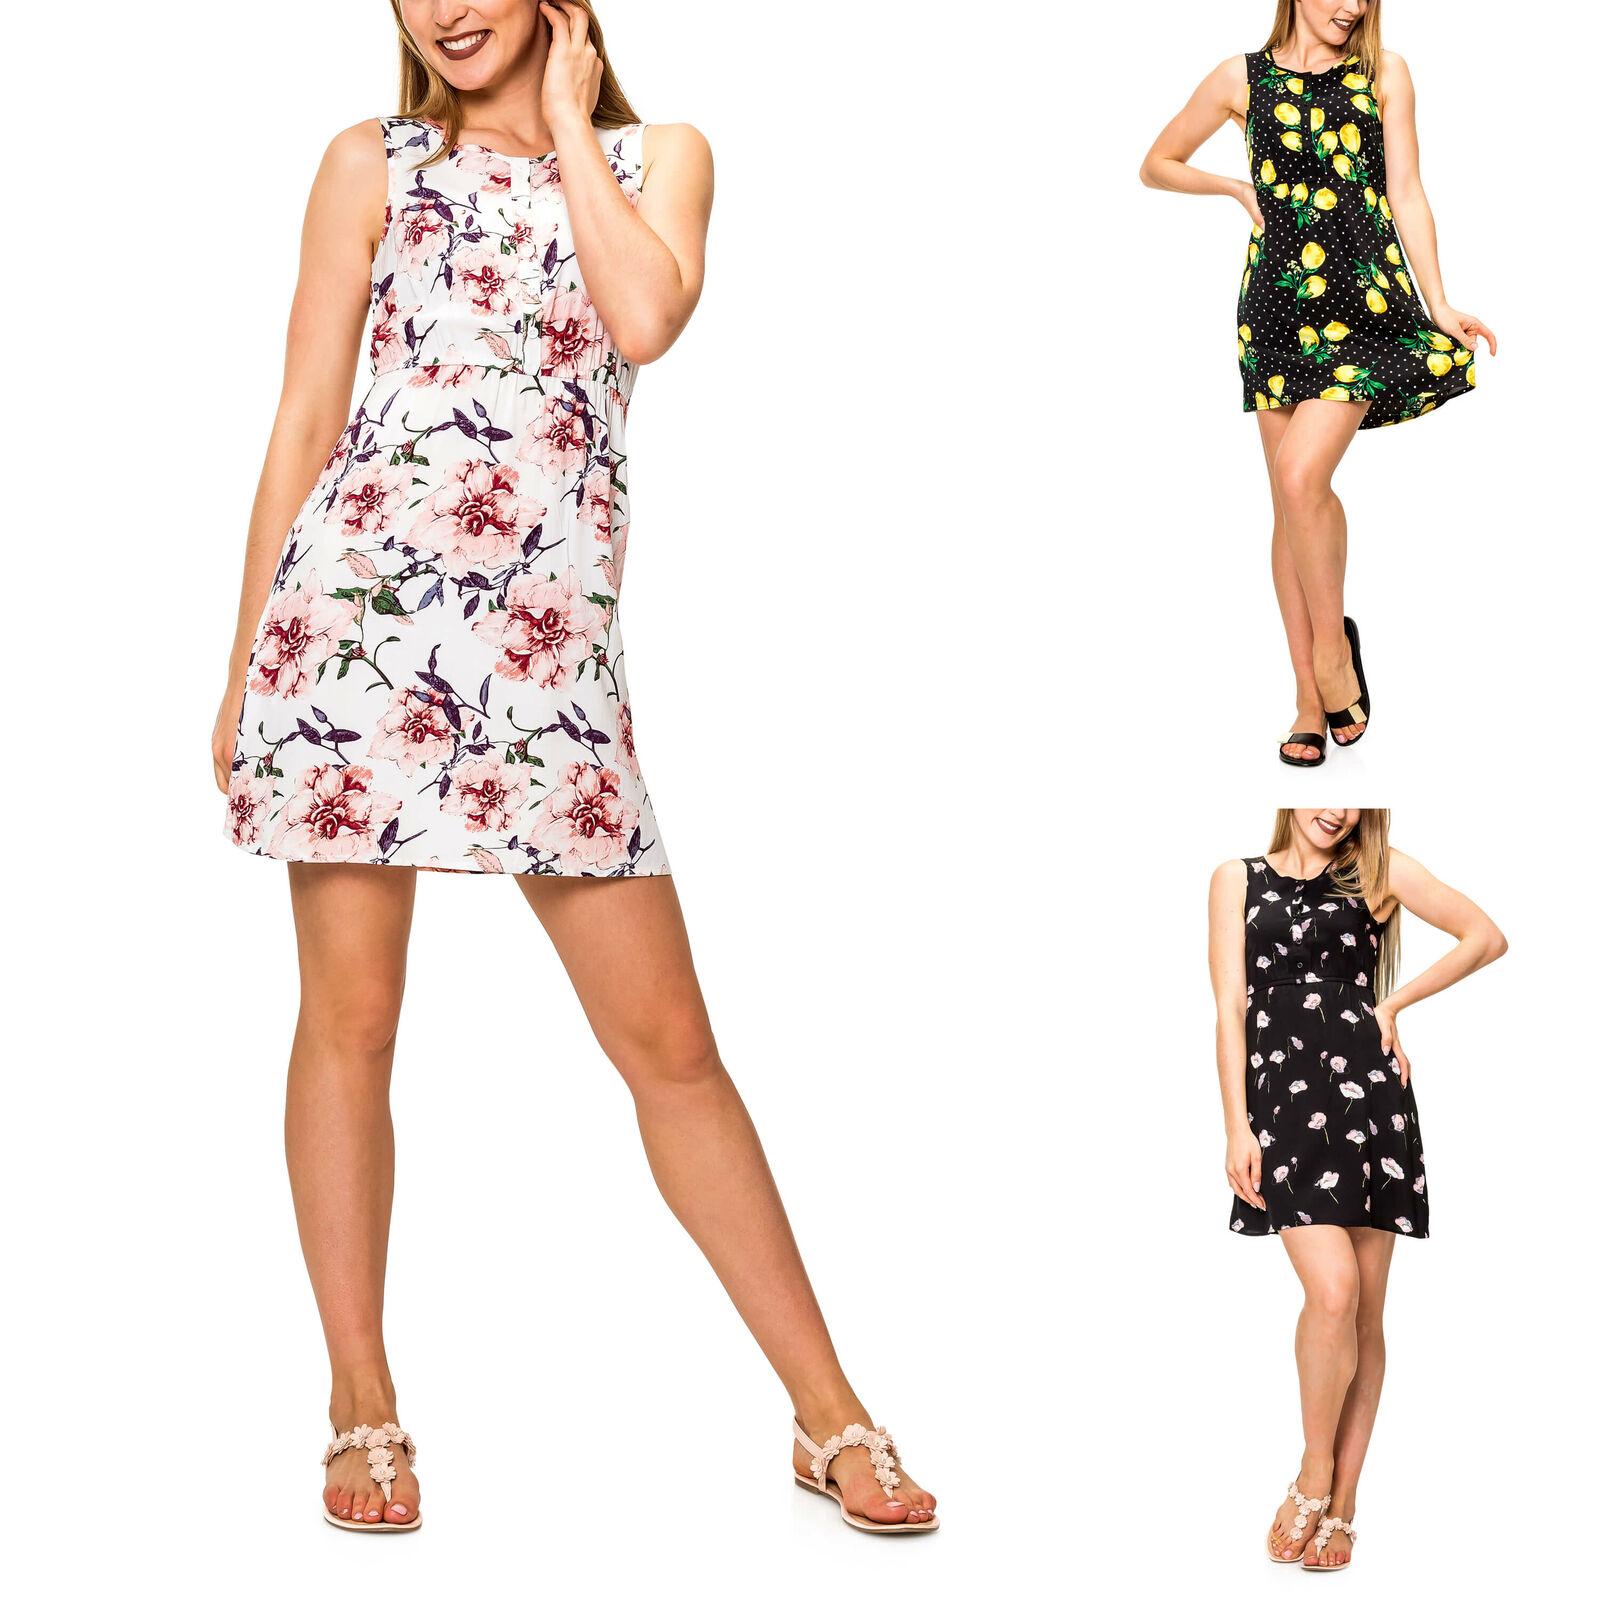 Hailys Damen Blusenkleid mit Knopfleiste Sommerkleid Minikleid Print Kleid